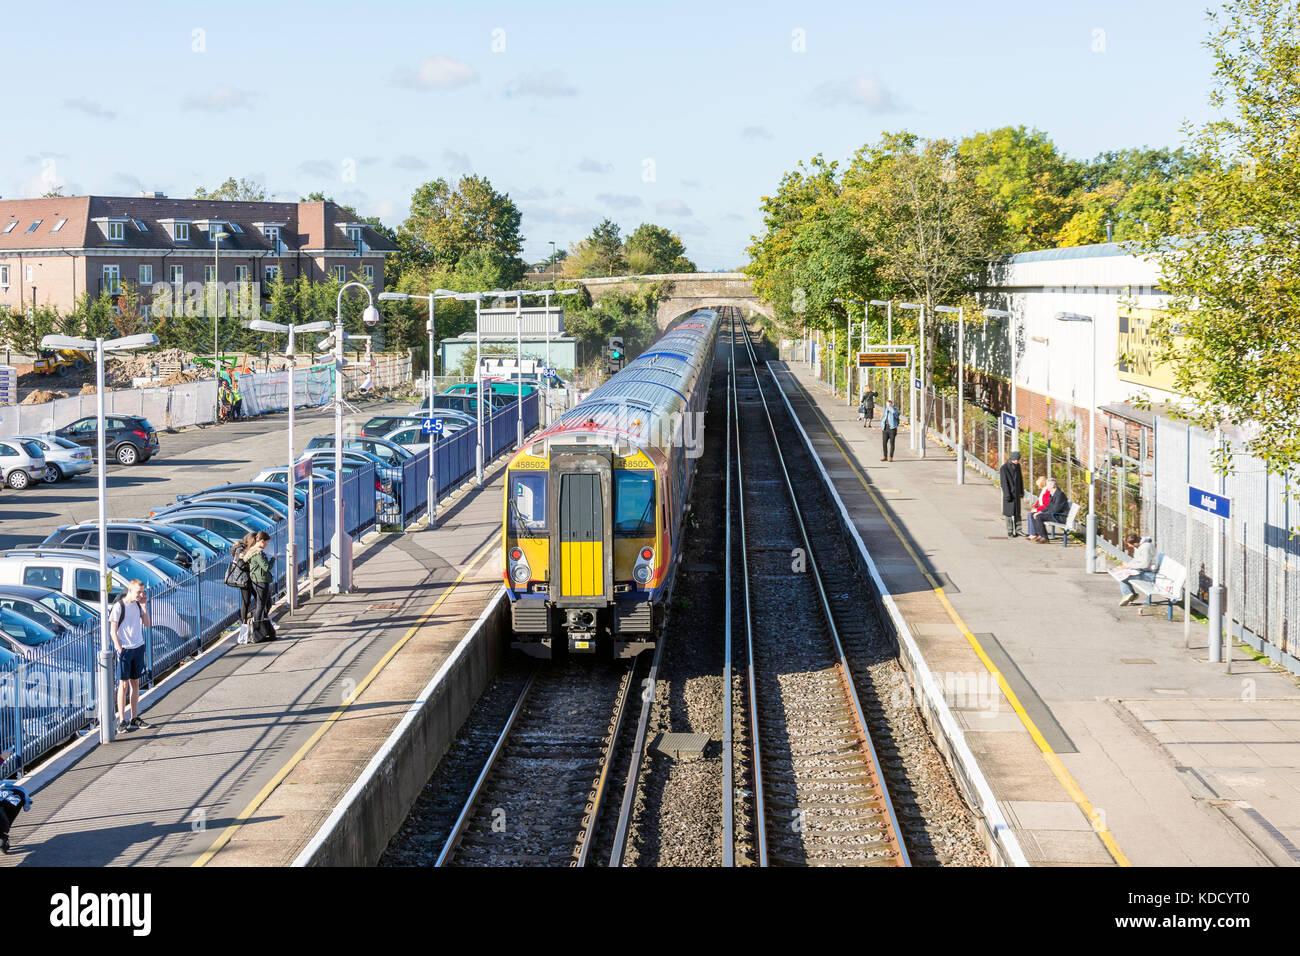 South West Train leaving Ashford Railway Station, Ashford, Surrey, England, United Kingdom - Stock Image